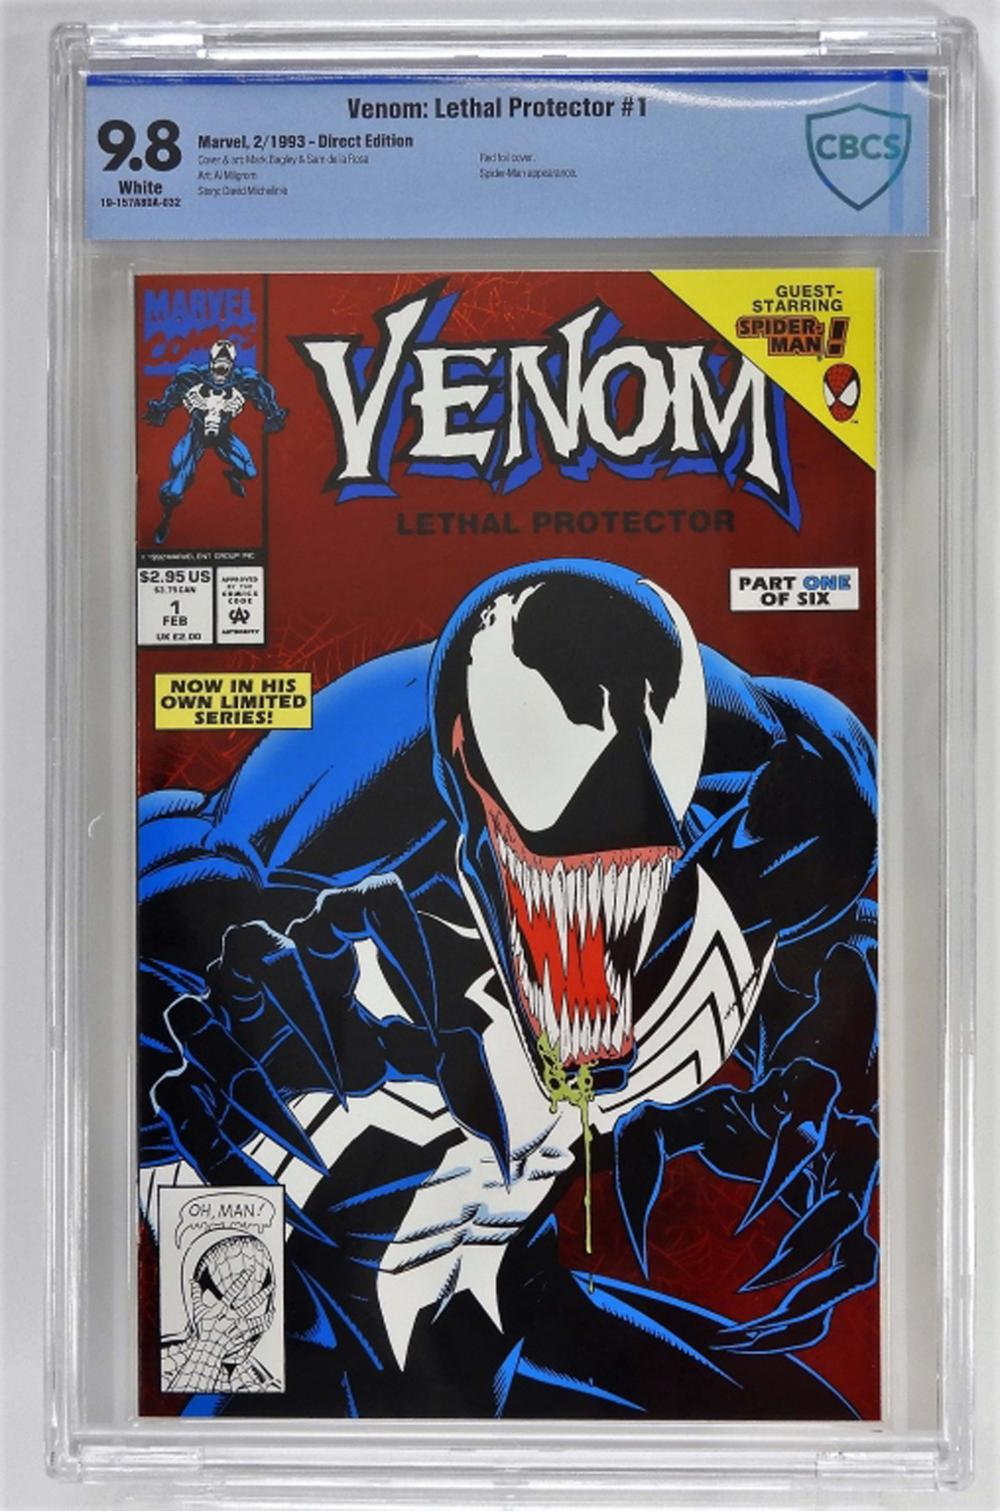 Marvel Venom: Lethal Protector #1 CBCS 9.8